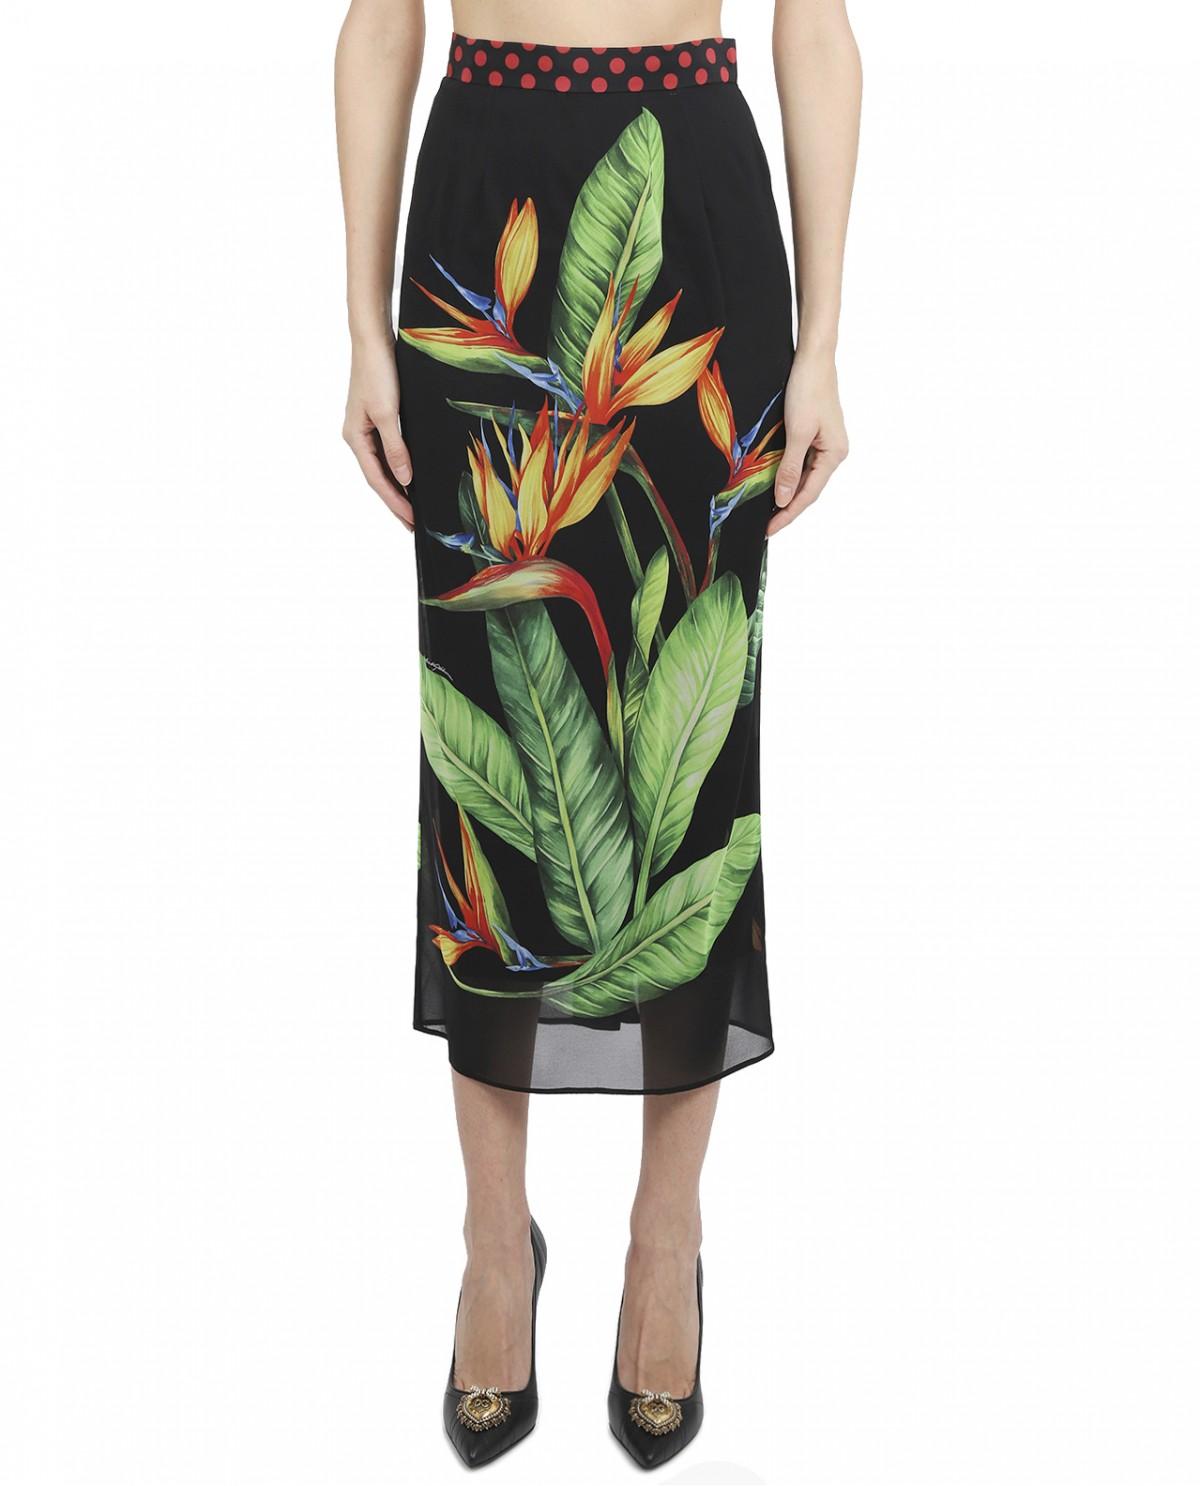 keke palmer styles dolce gabbana herstylecode 1 Keke Palmer Styles: Dolce & Gabbana Cropped Top & Floral Skirt